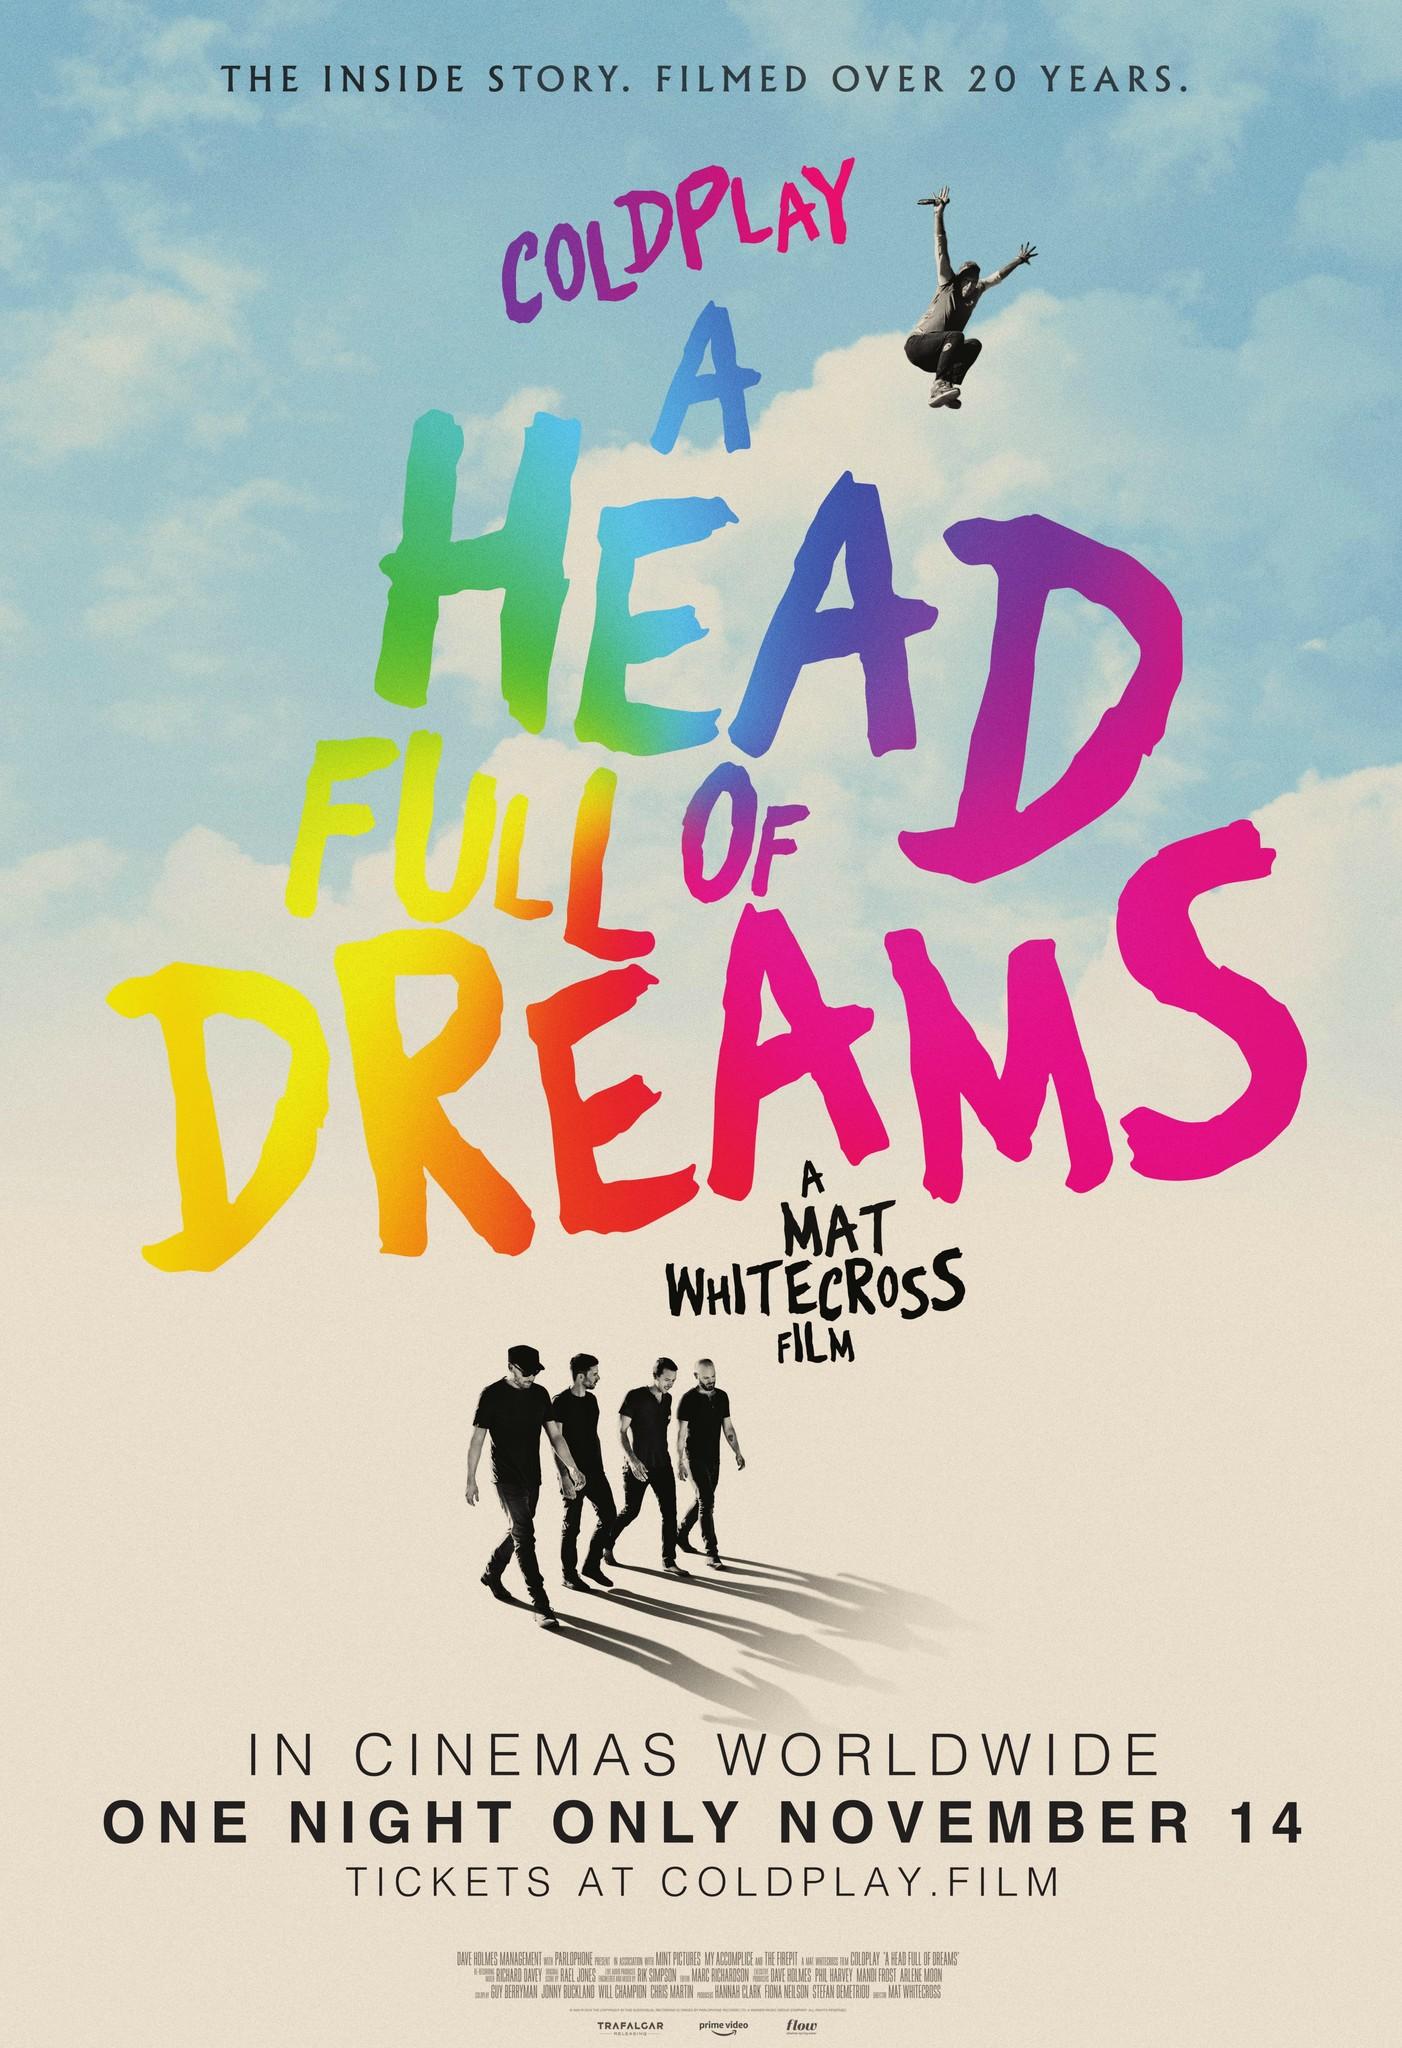 Coldplay: A Head Full of Dreams kapak